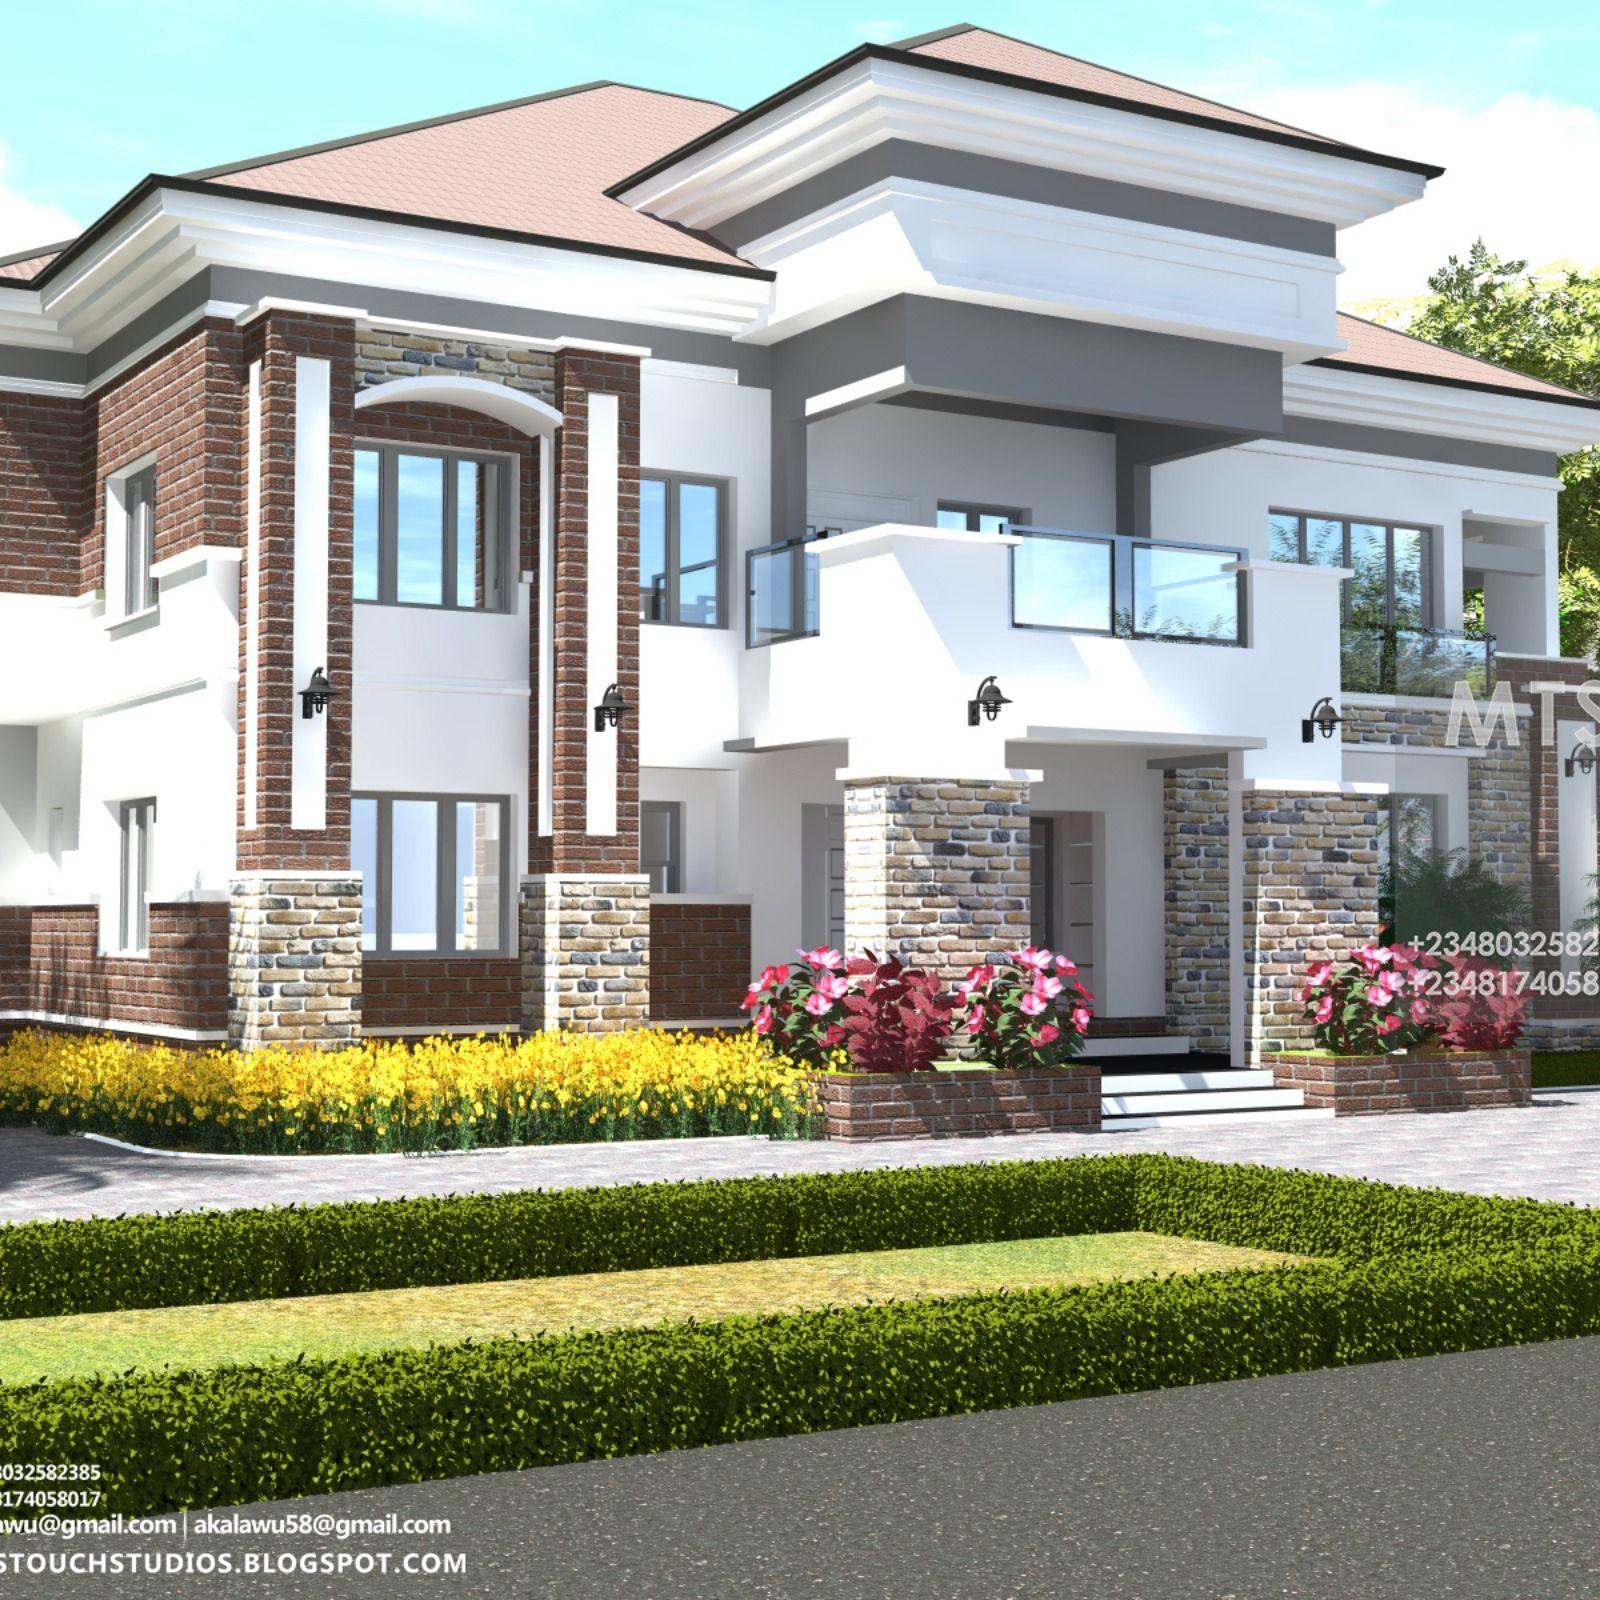 6 BEDROOM DUPLEX (RF D6003) -   Duplex house design ...